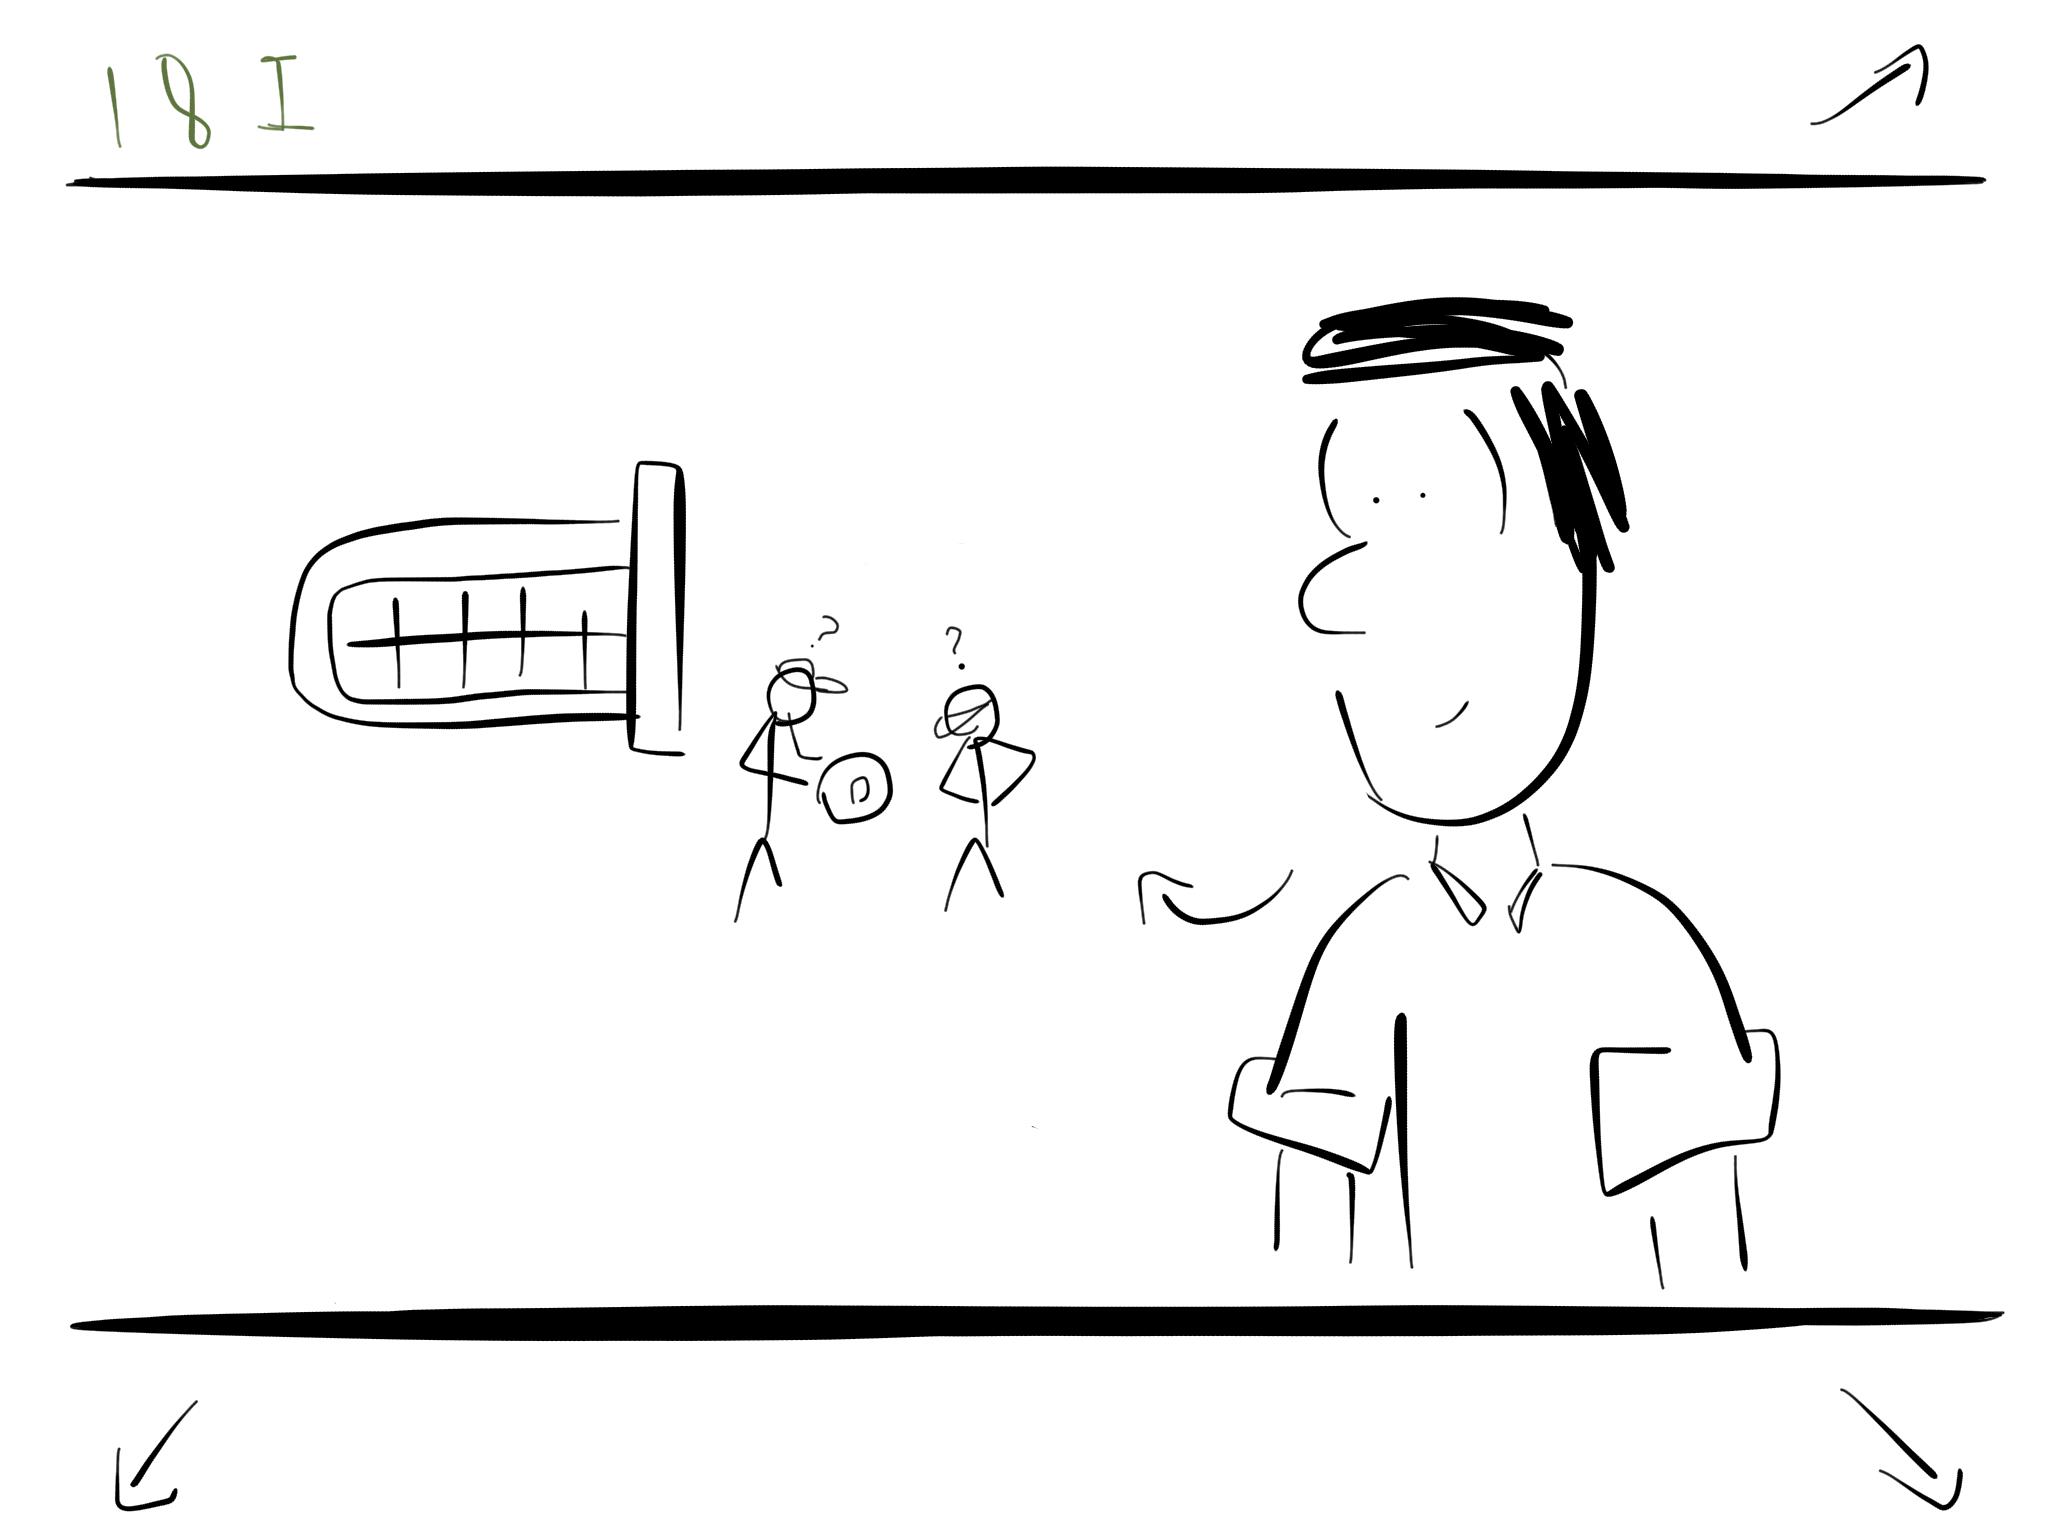 BDF_Storyboards_91.jpg